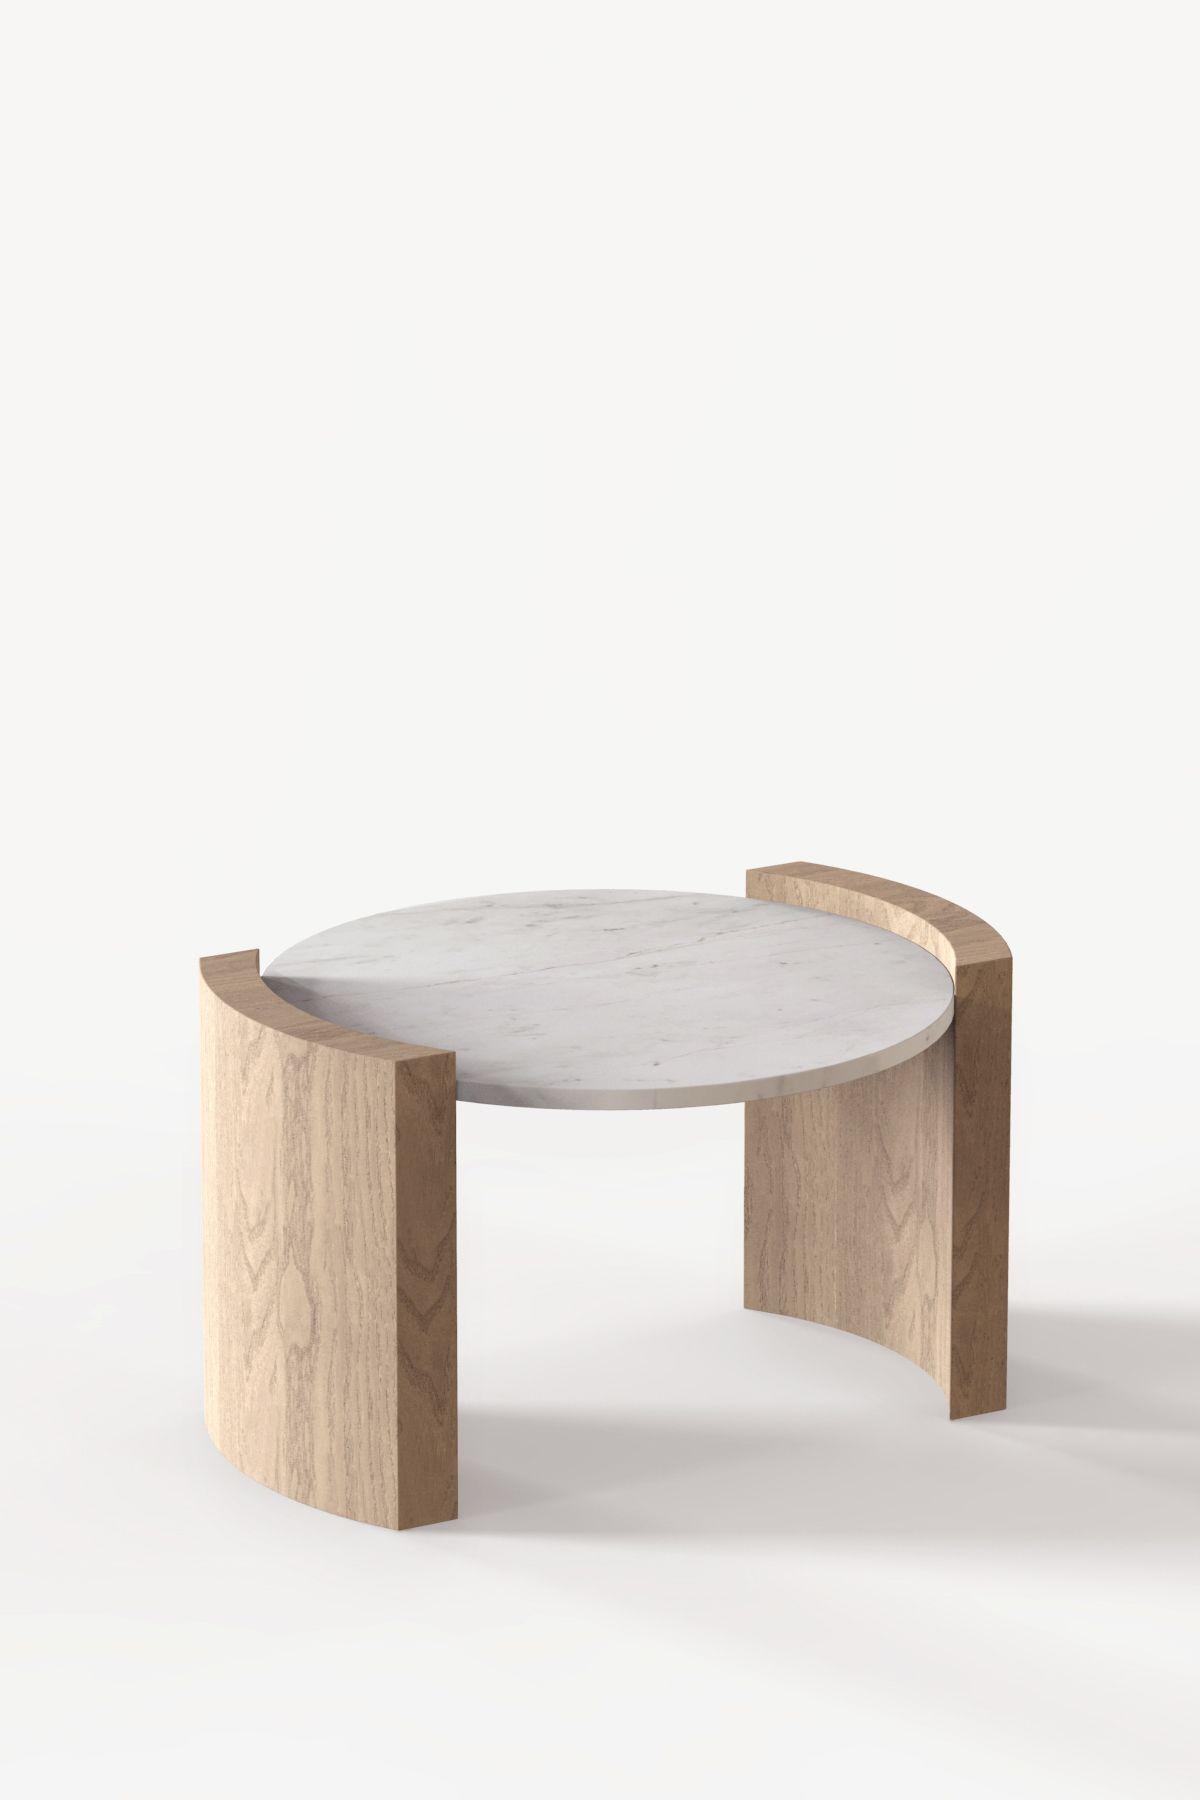 Jia Small Coffee Table Con Imagenes Coleccion De Muebles Muebles Salon Muebles Frescos